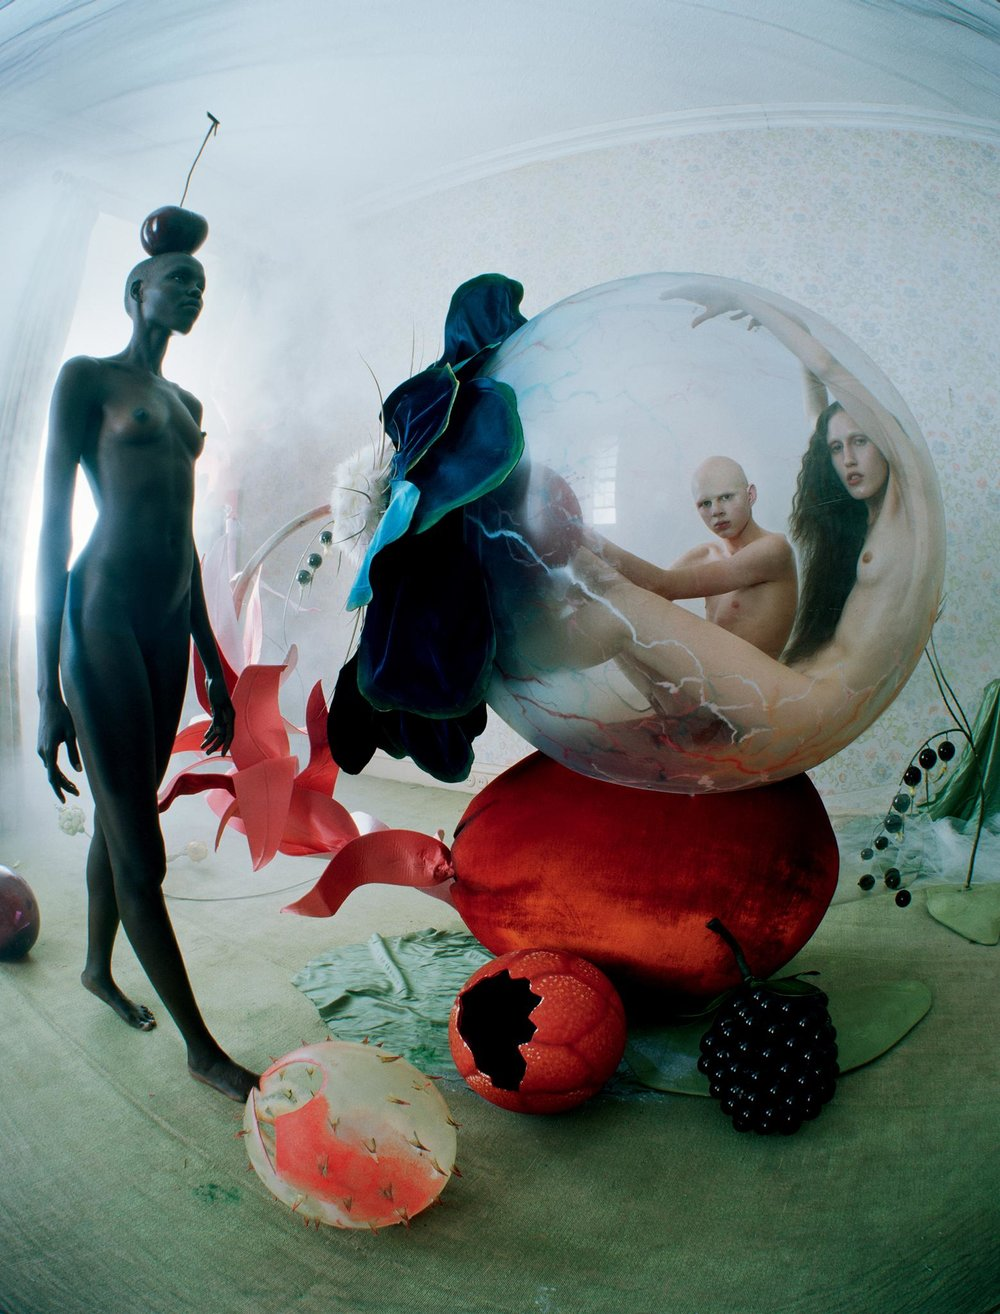 Tim_Walker-Love_Magazine-02.jpg